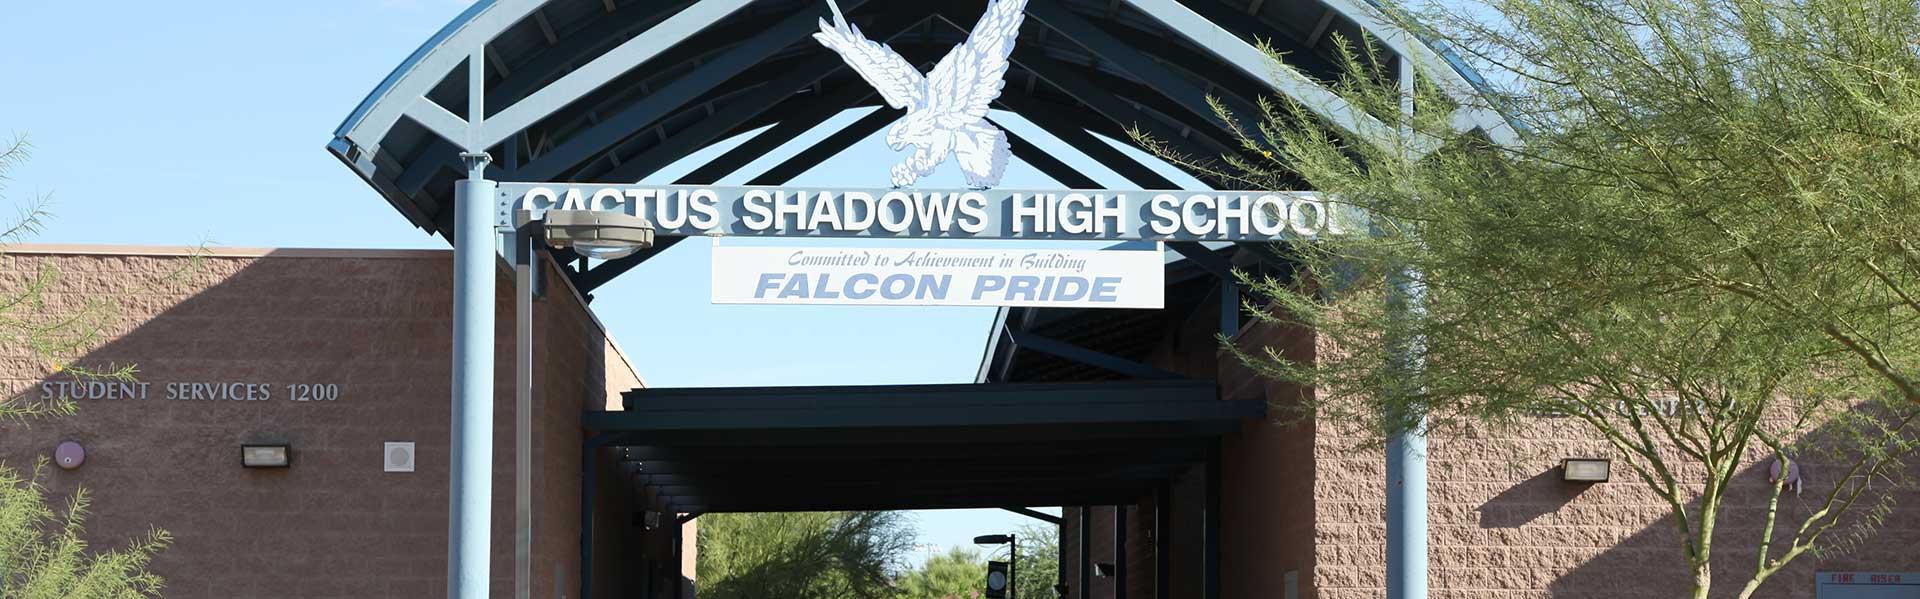 CaveCreekUnified-Public-Arizona-USA-School-Entrance